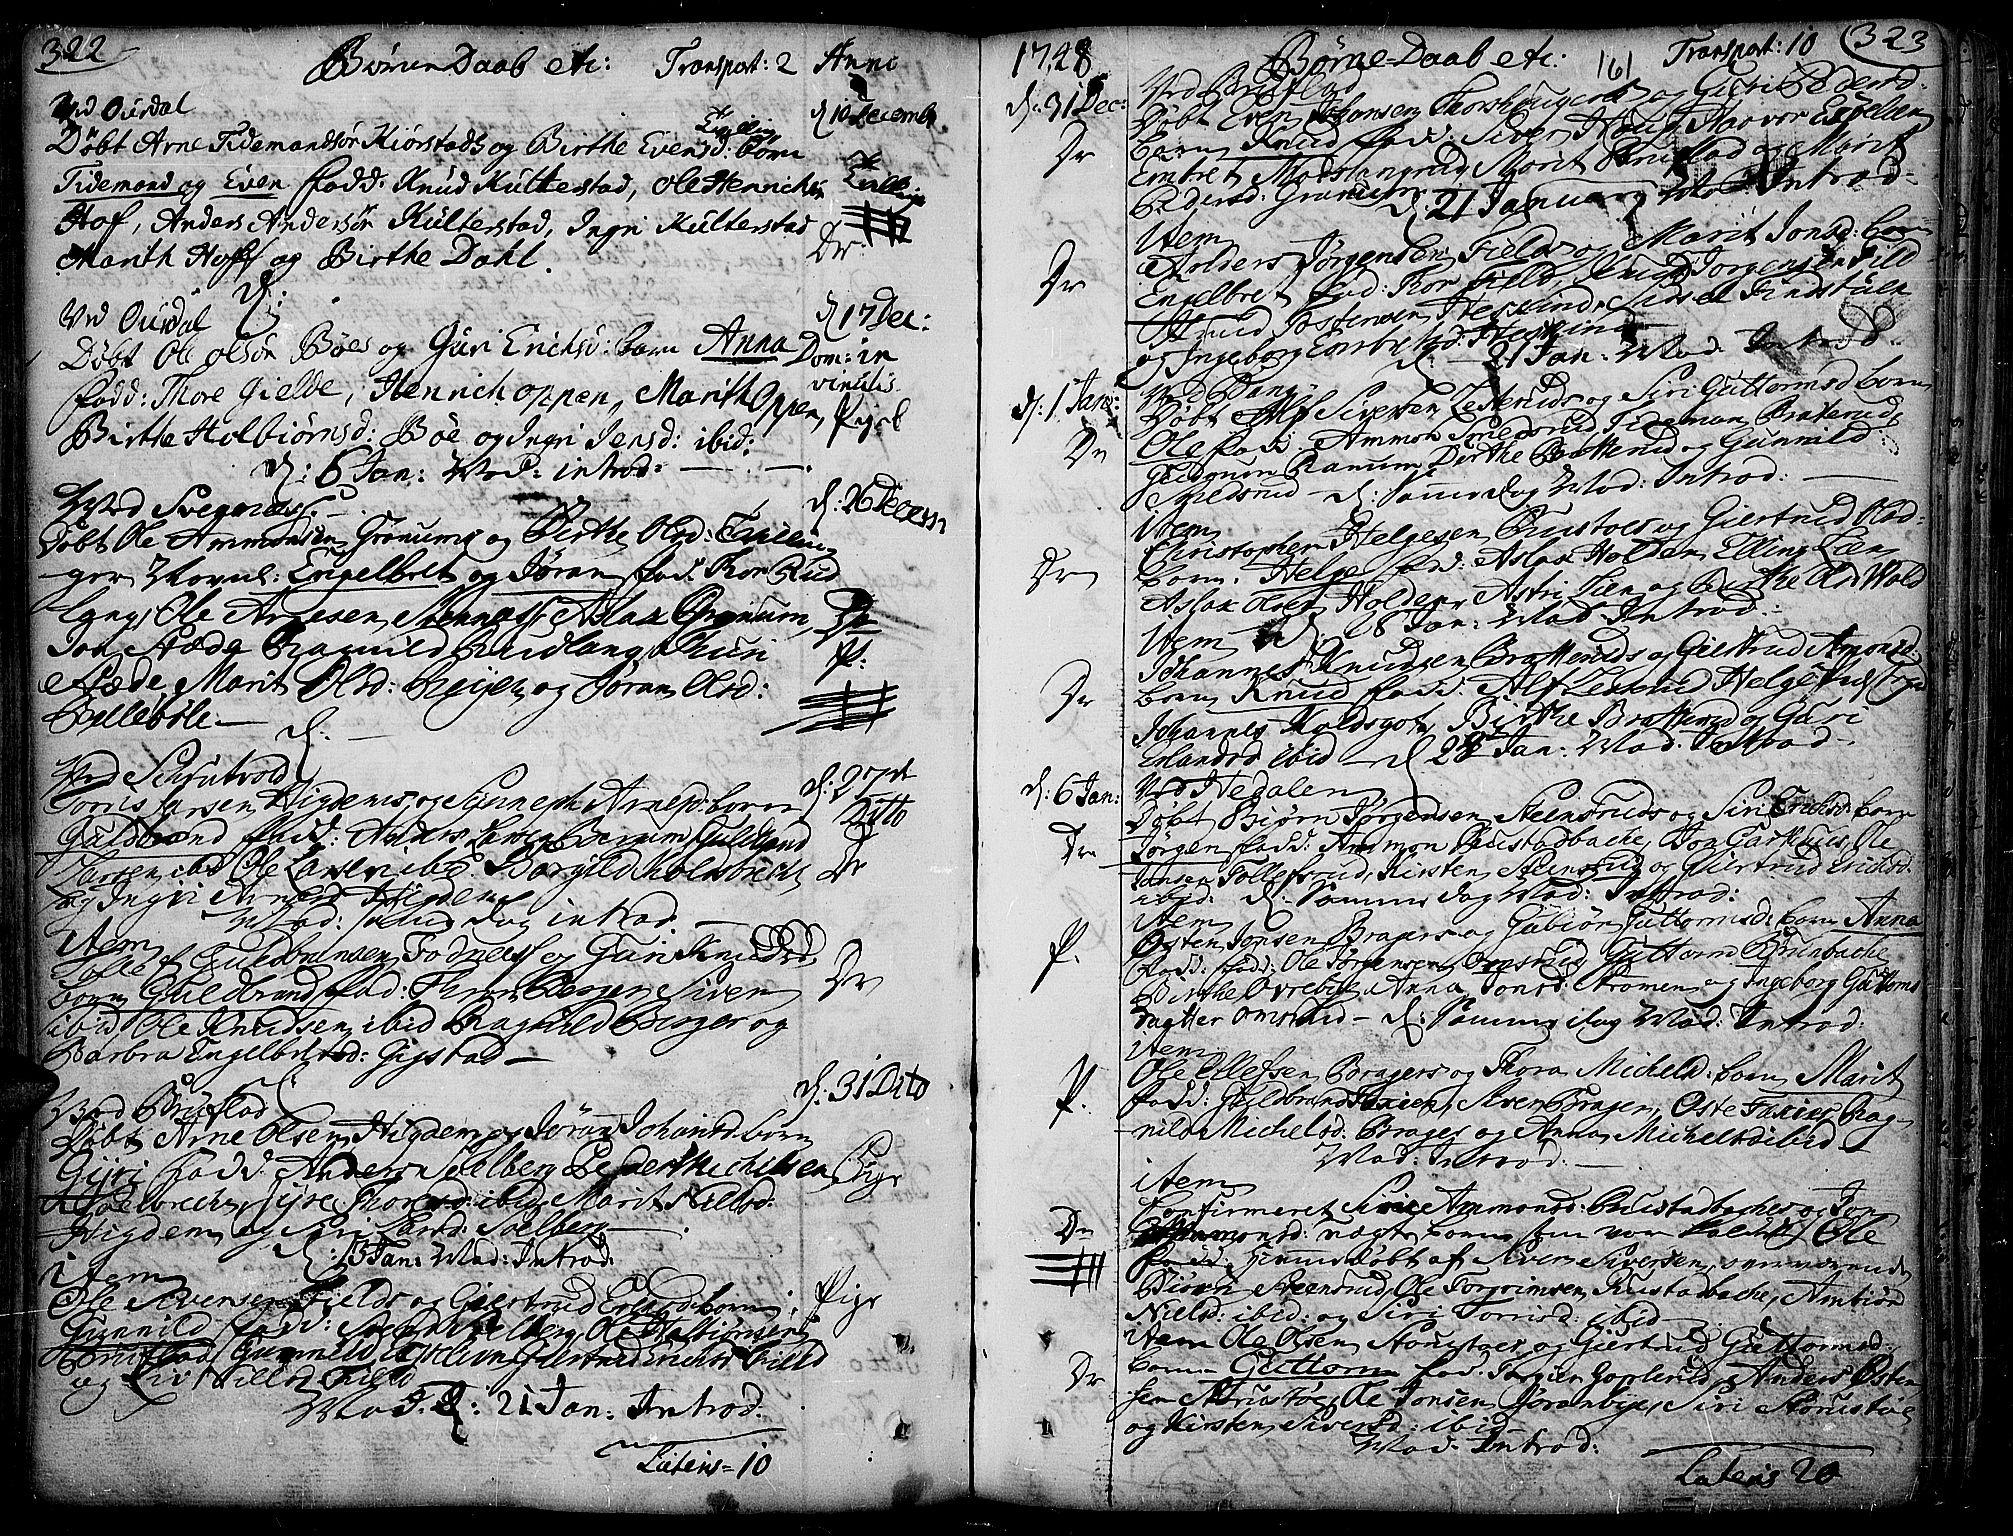 SAH, Aurdal prestekontor, Ministerialbok nr. 4, 1730-1762, s. 322-323